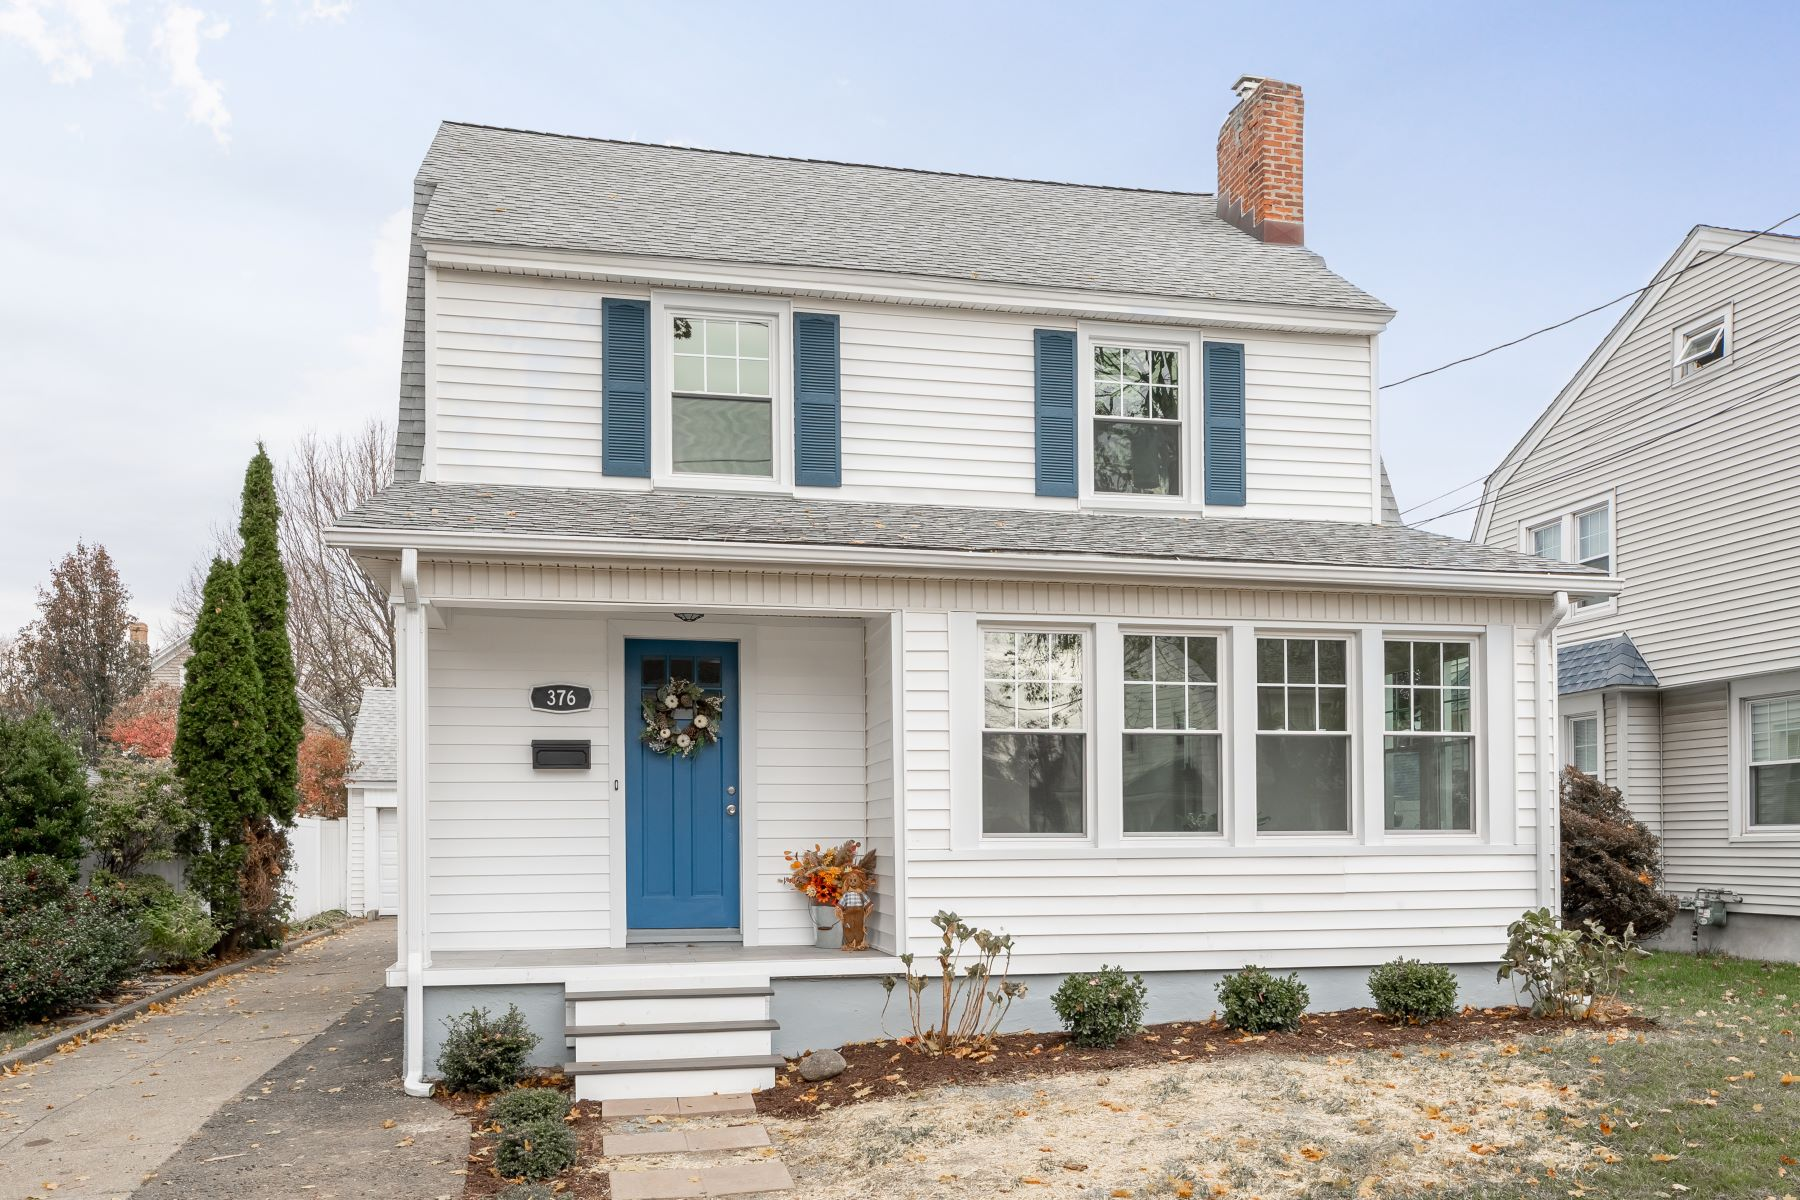 Single Family Homes pour l Vente à Beautifully Updated 376 Windsor Avenue Stratford, Connecticut 06614 États-Unis